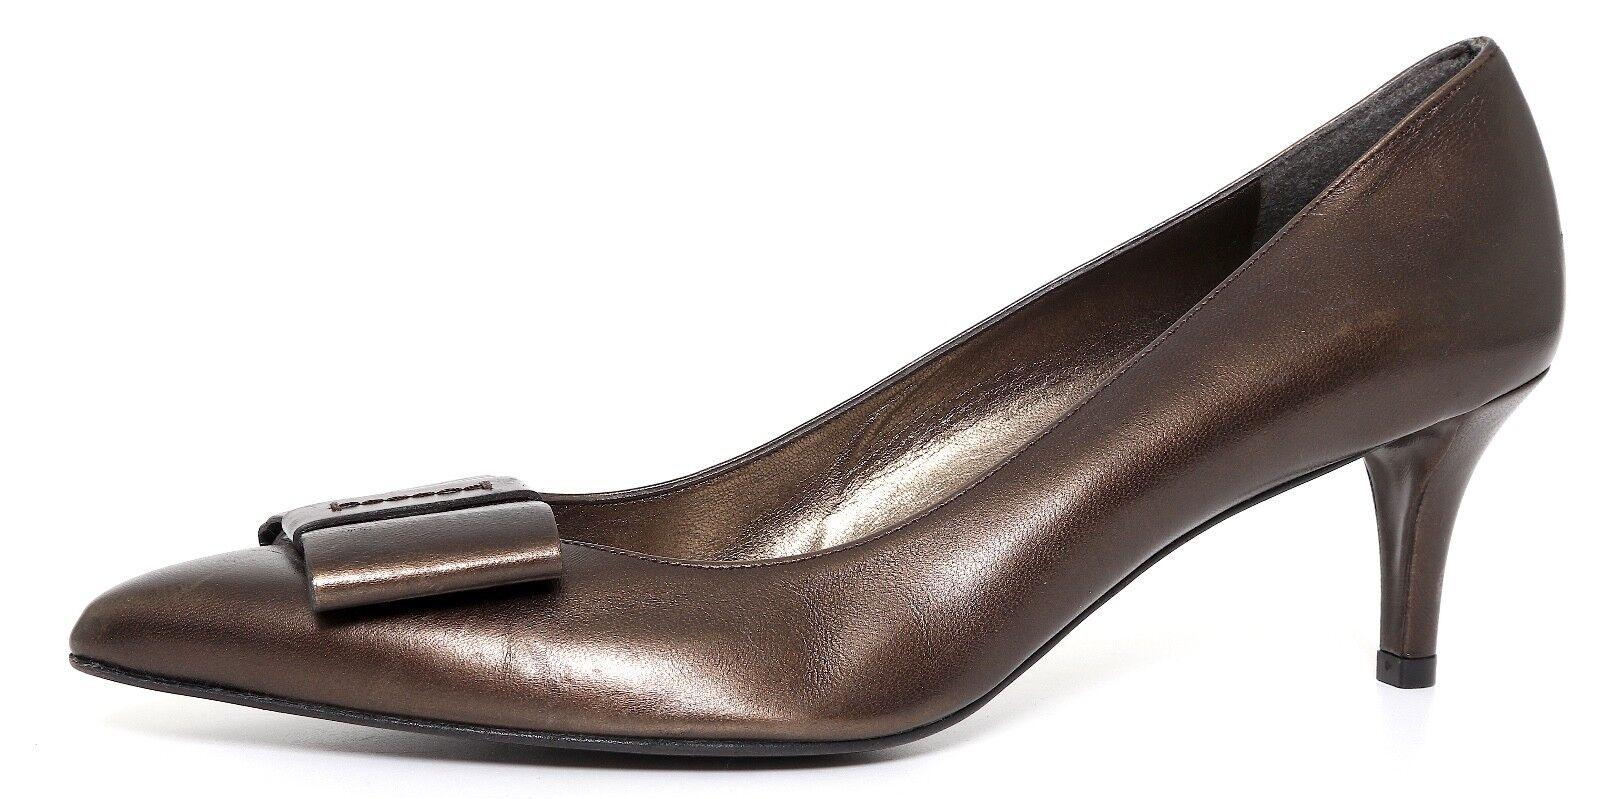 migliore vendita Stuart Weitzman Pointed Toe Bow Leather Low Heel Metallic donna donna donna Sz 11 SS 9768  risparmia fino al 70%